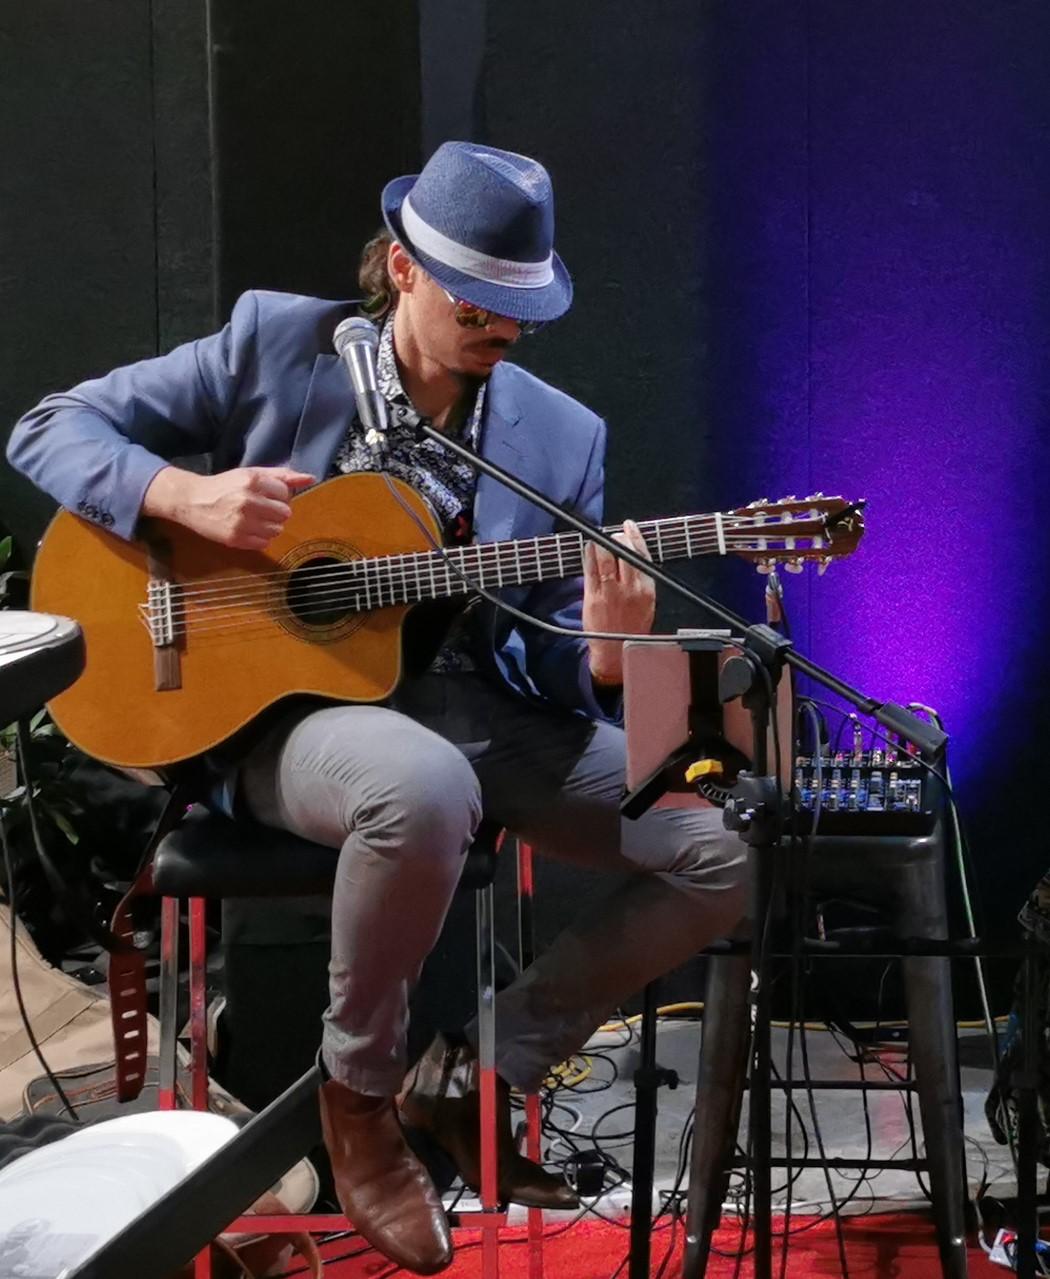 Ricky de Medeiros solo guitar performance